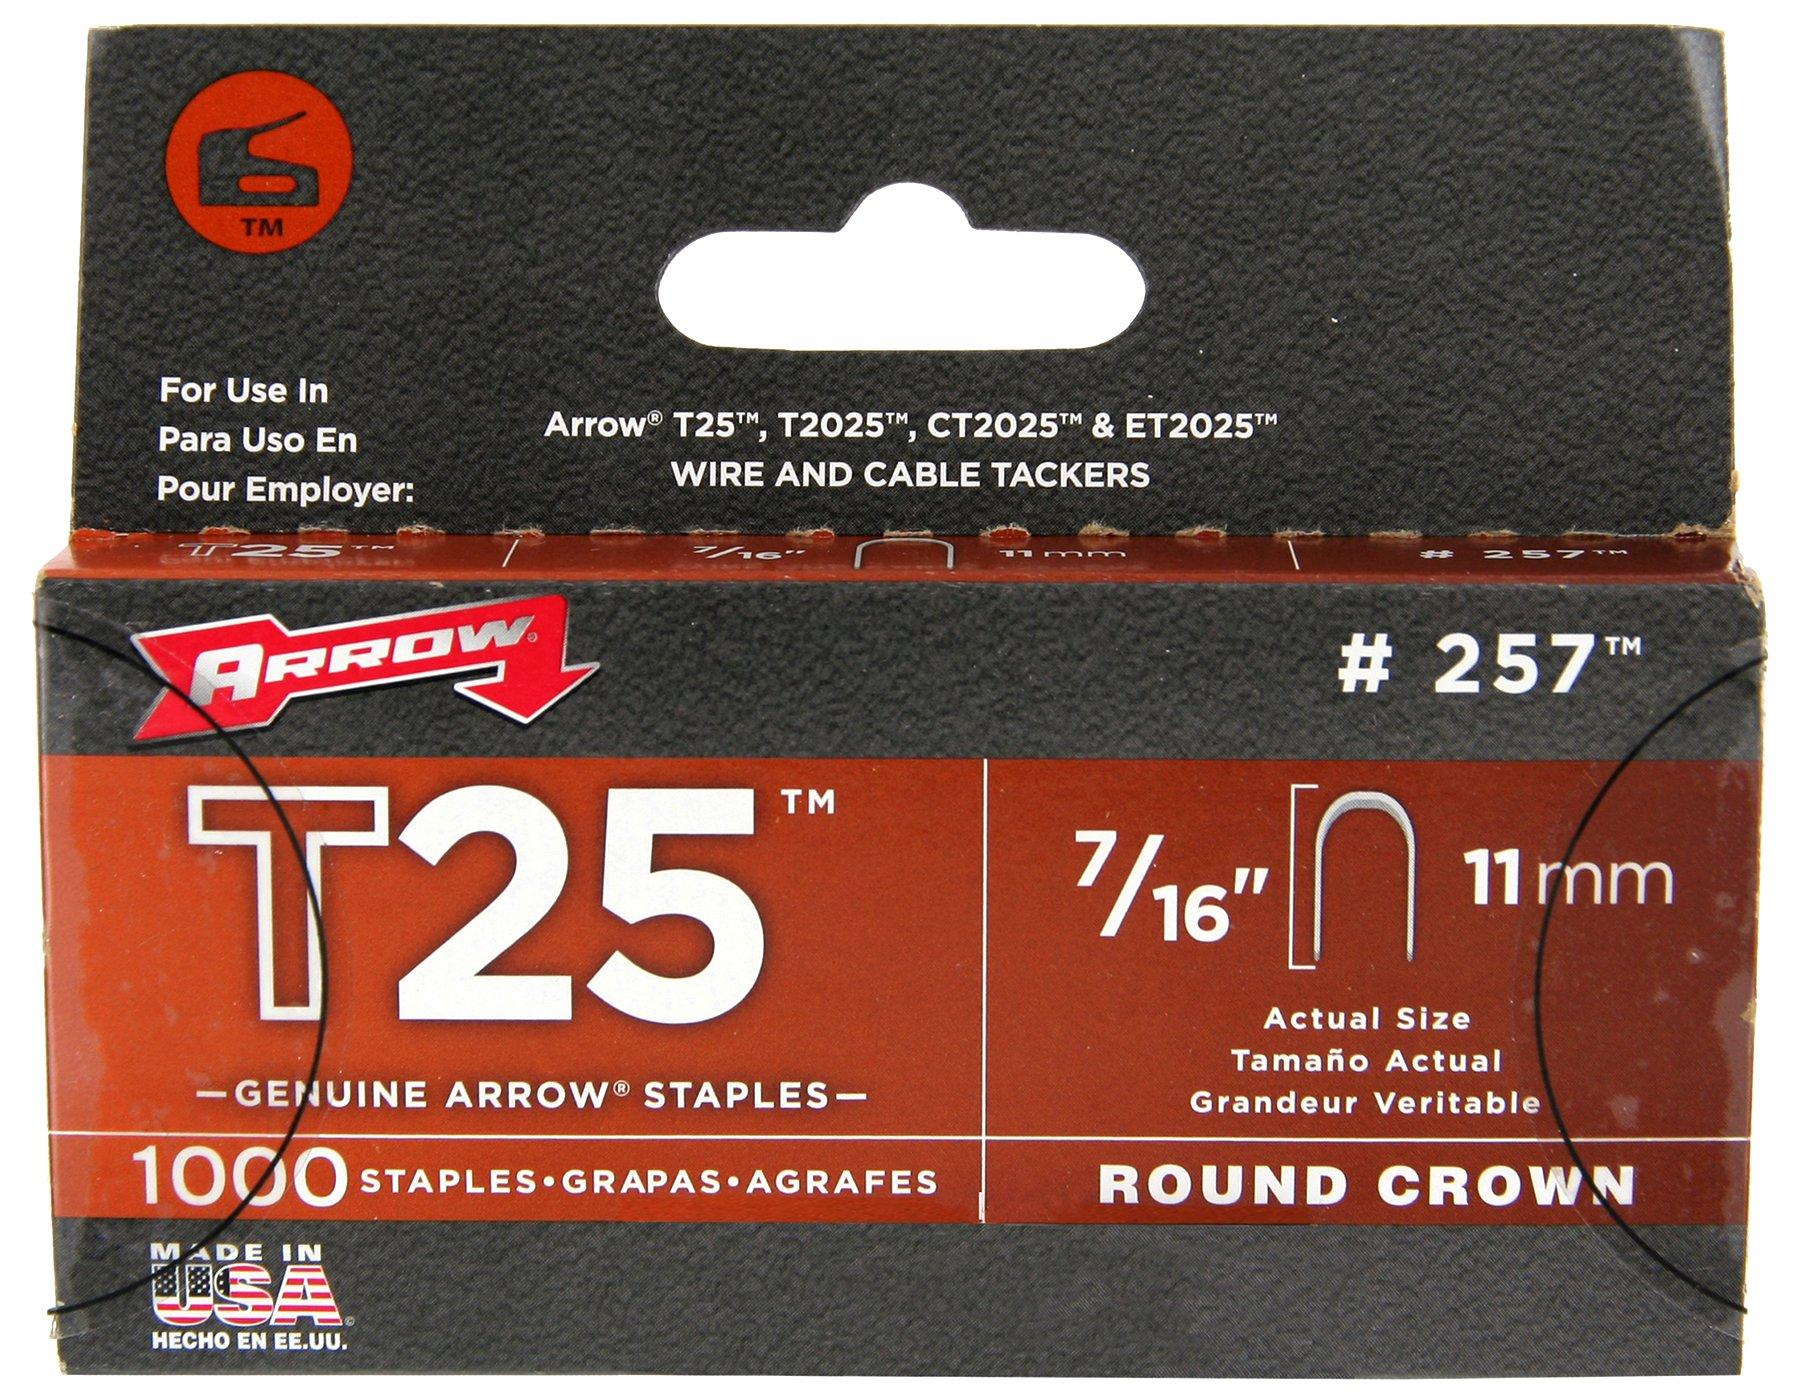 Arrow Fastener 257M Genuine 7/16-Inch T25 Staples, 1,000-Pack